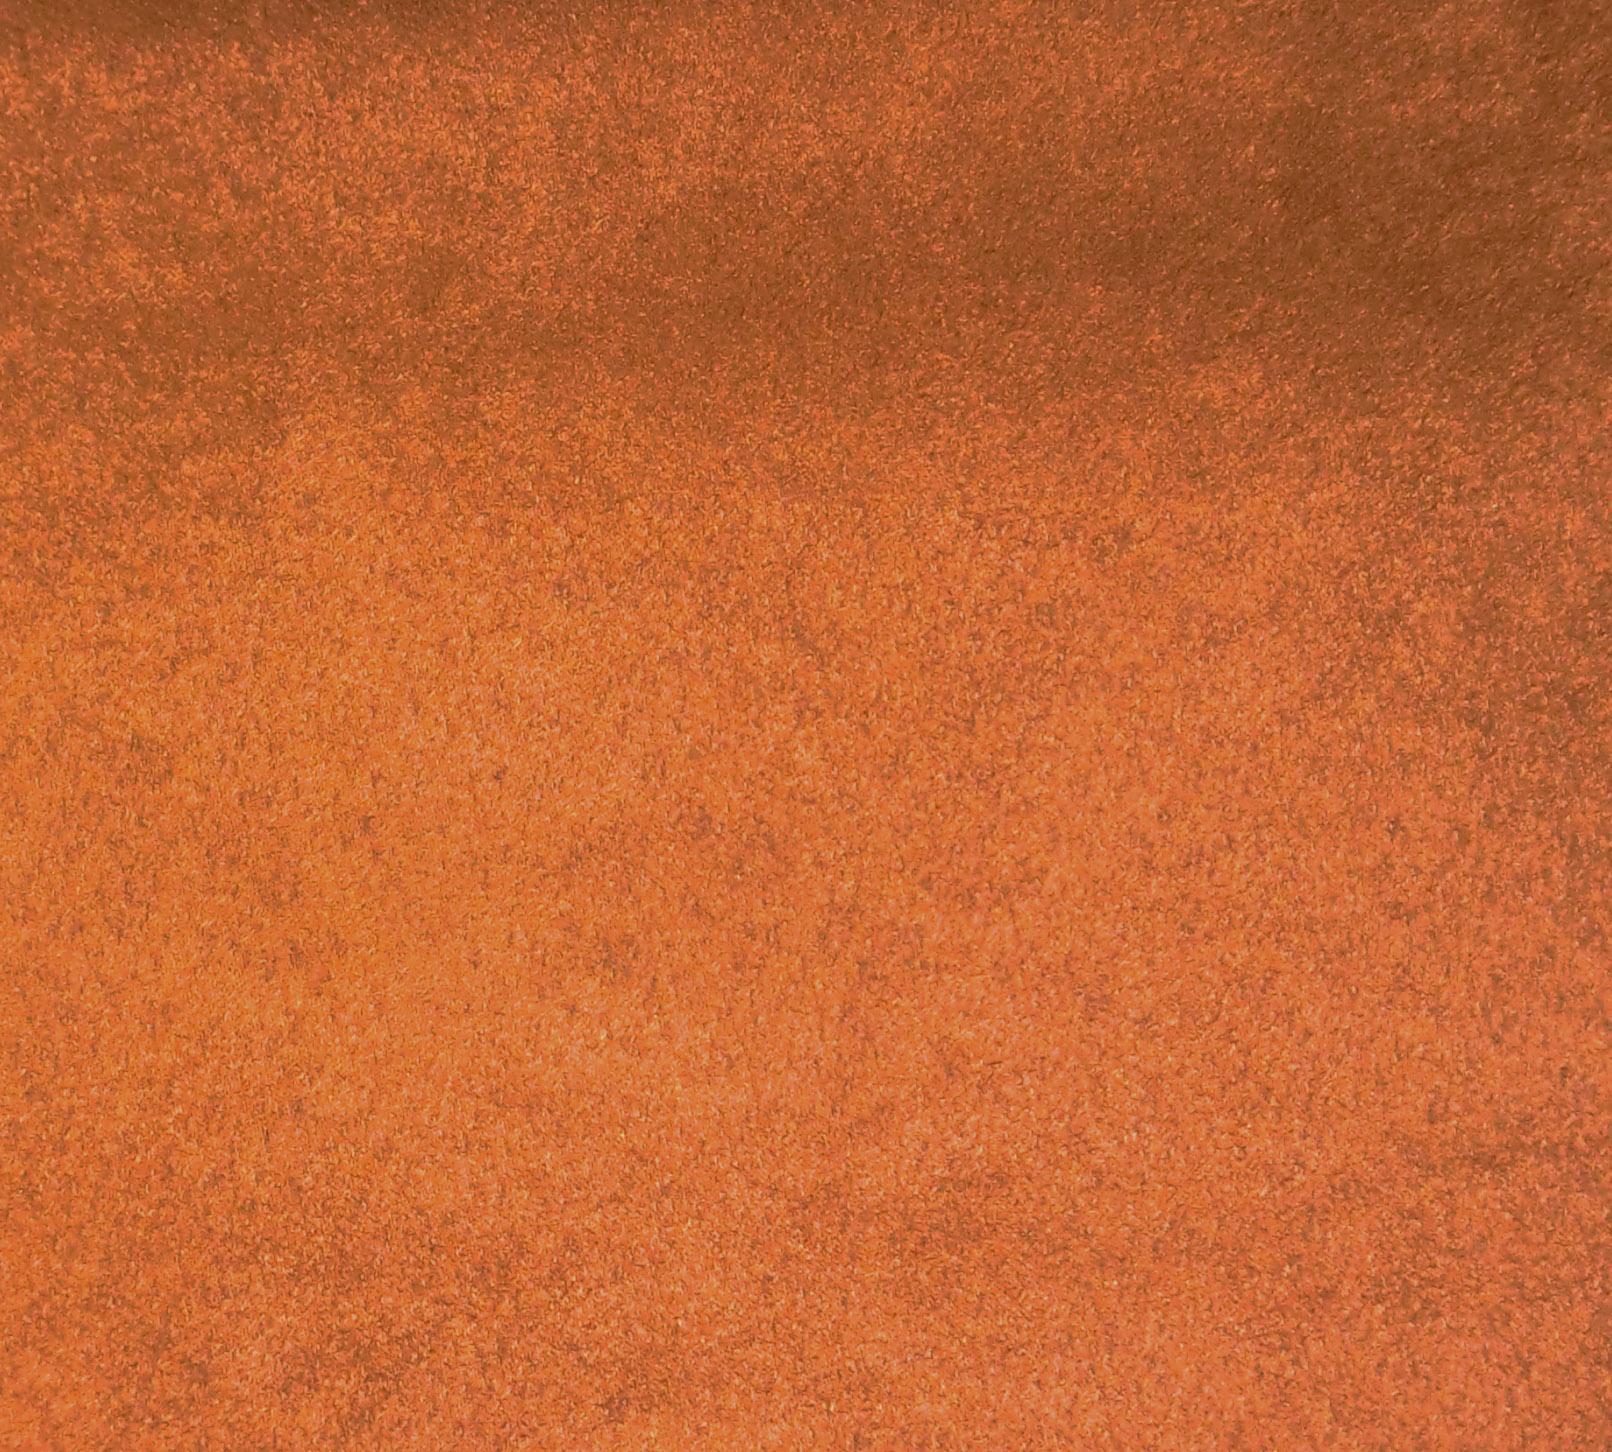 Infinity Fabrics Passion Suede Copper Interiordecorating Com